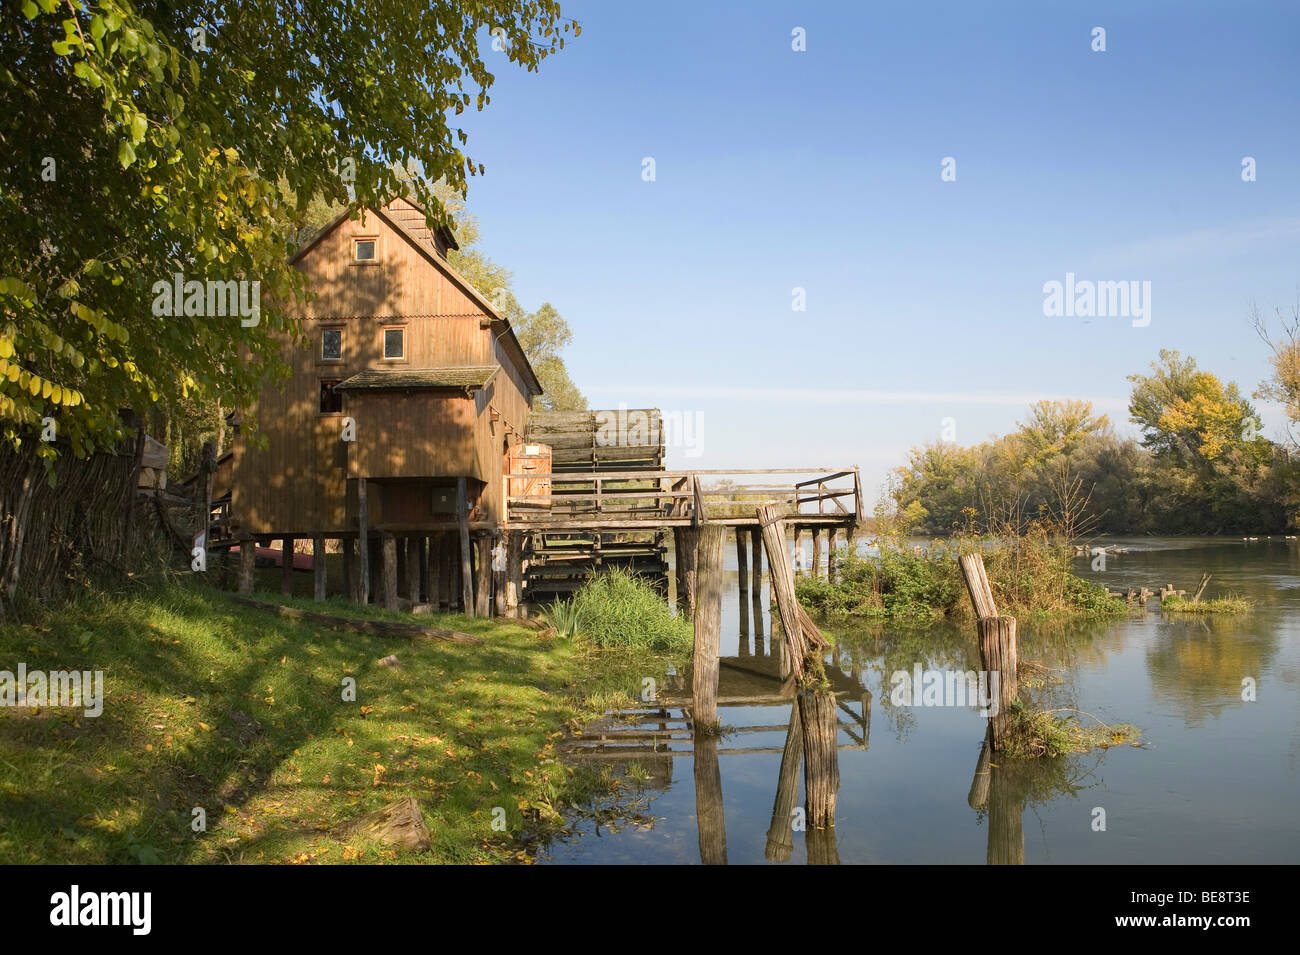 Wooden water mill in Jelka,. Slovakia. - Stock Image